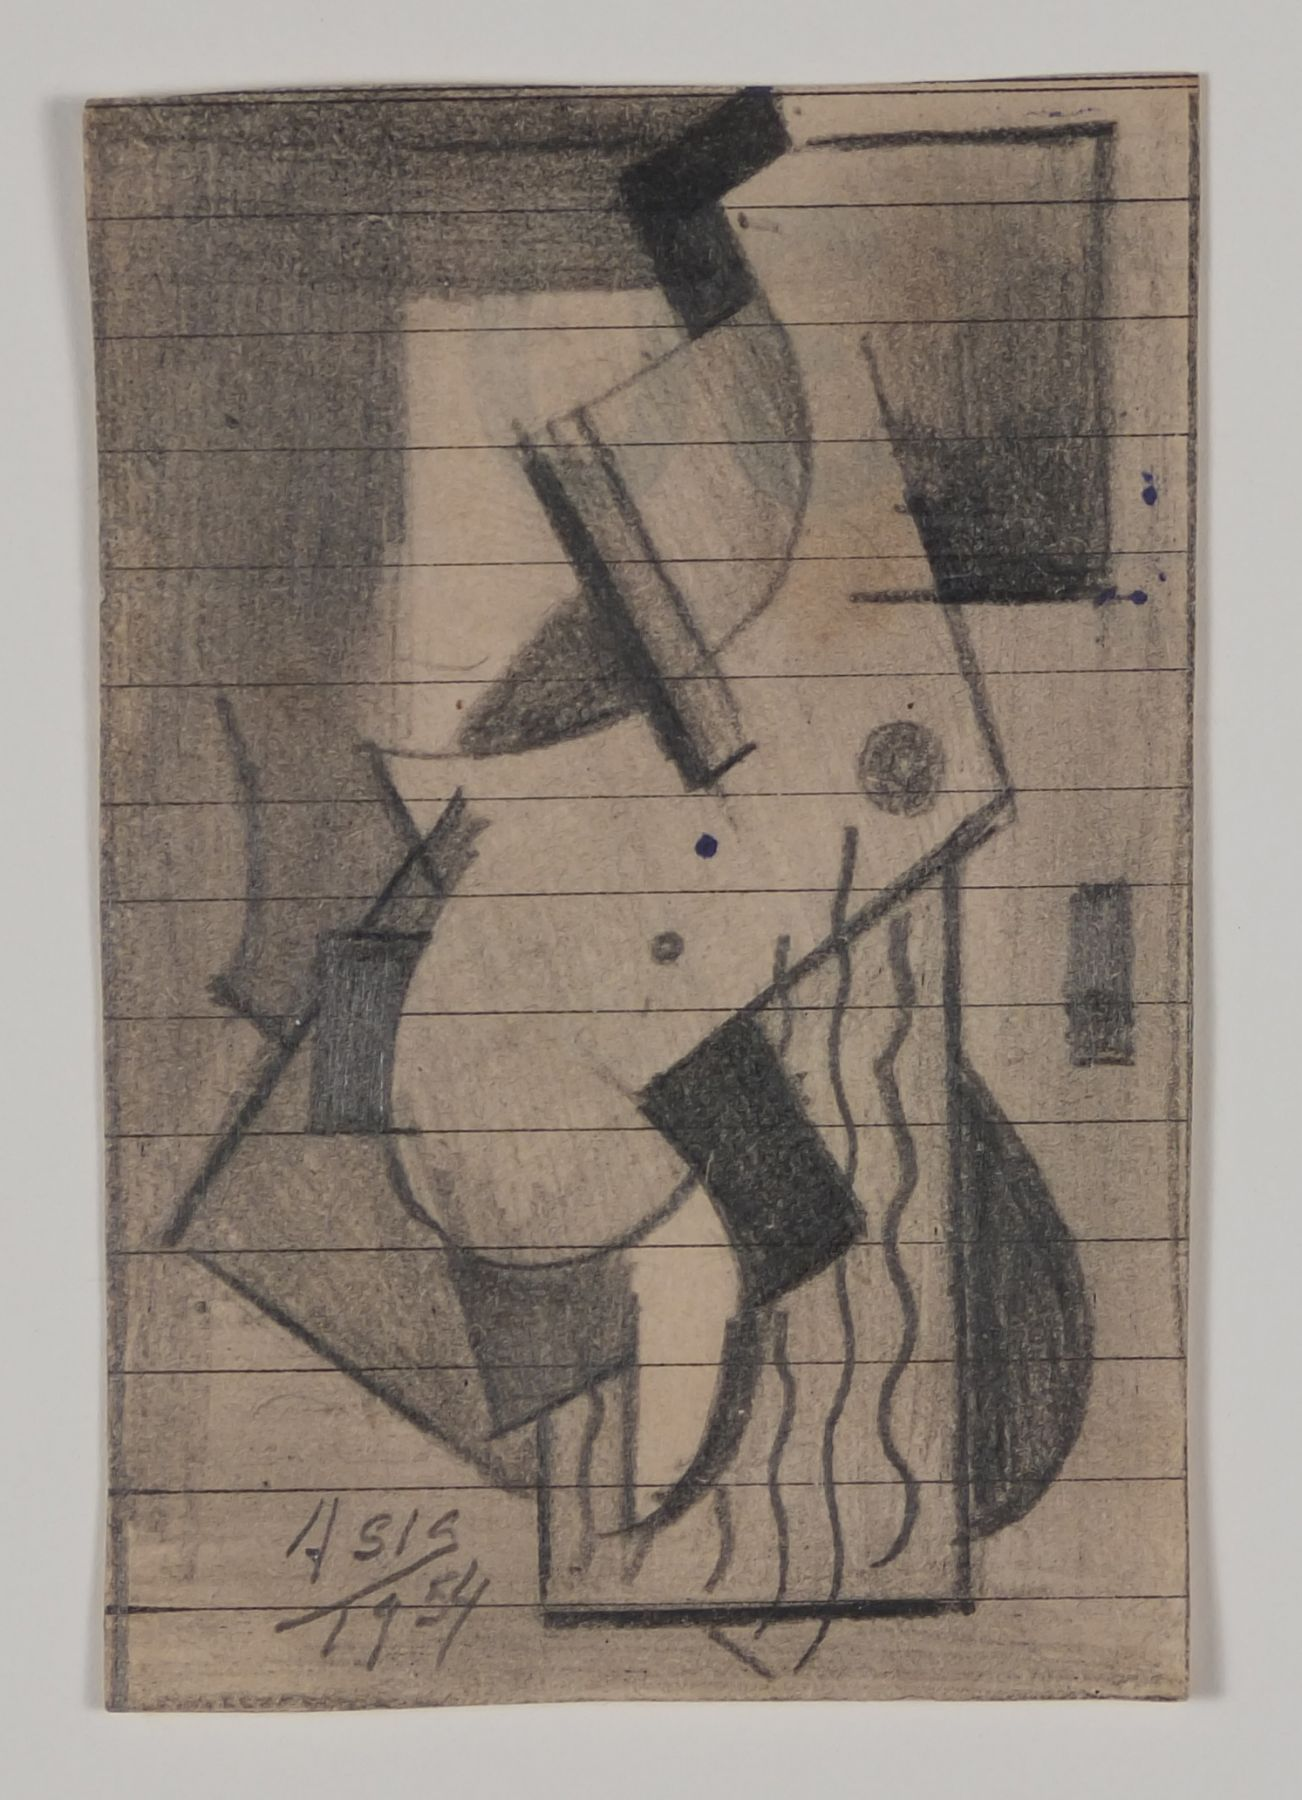 Antonio Asis, Untitled, 1954,Graphite on paper,3 3/8 x 2 1/16 in. (8.6 x 5.3 cm.)